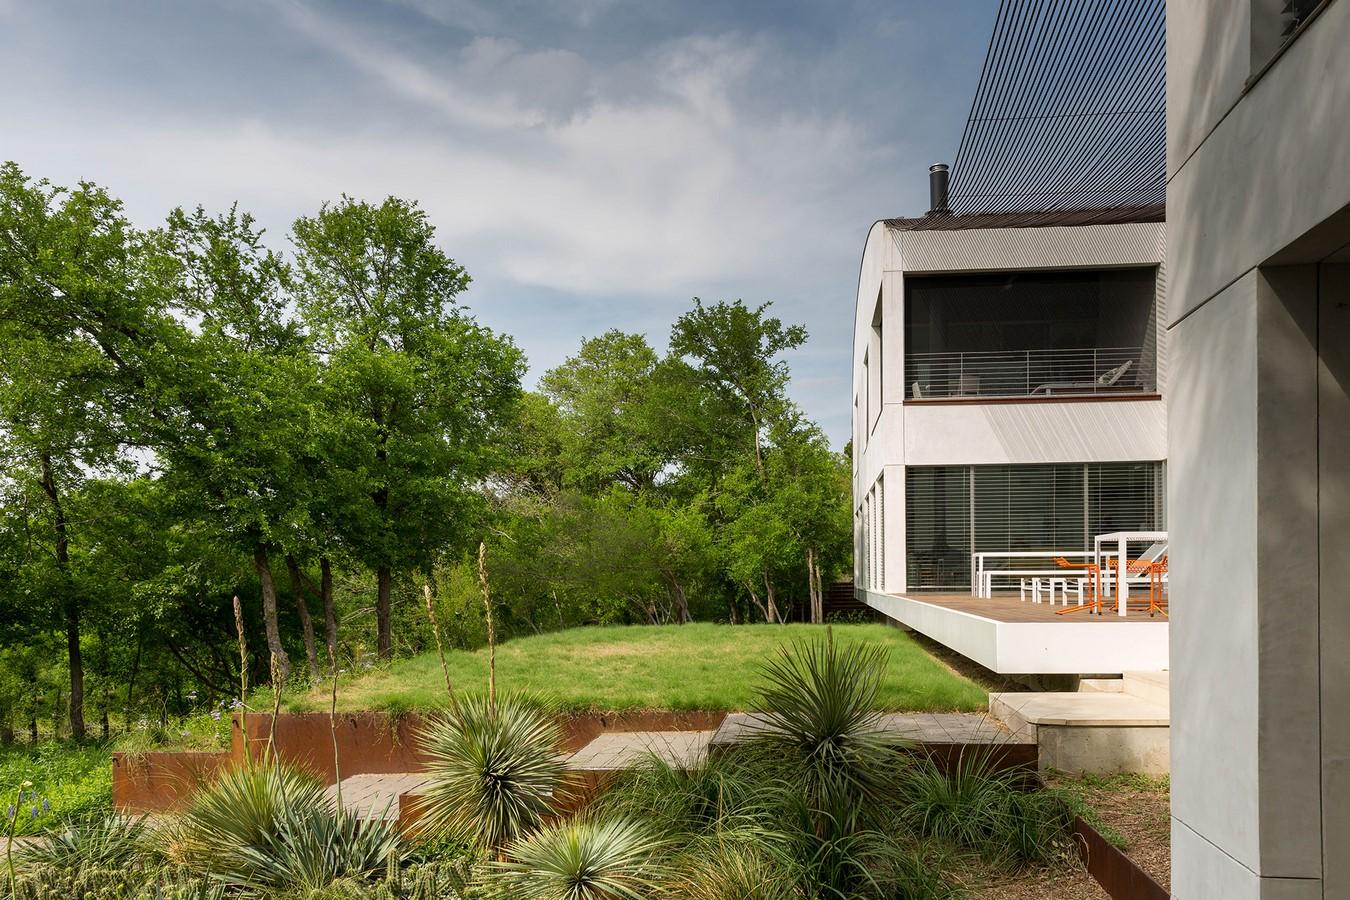 Westridge Residence by Miró Rivera Architects - Sheet2